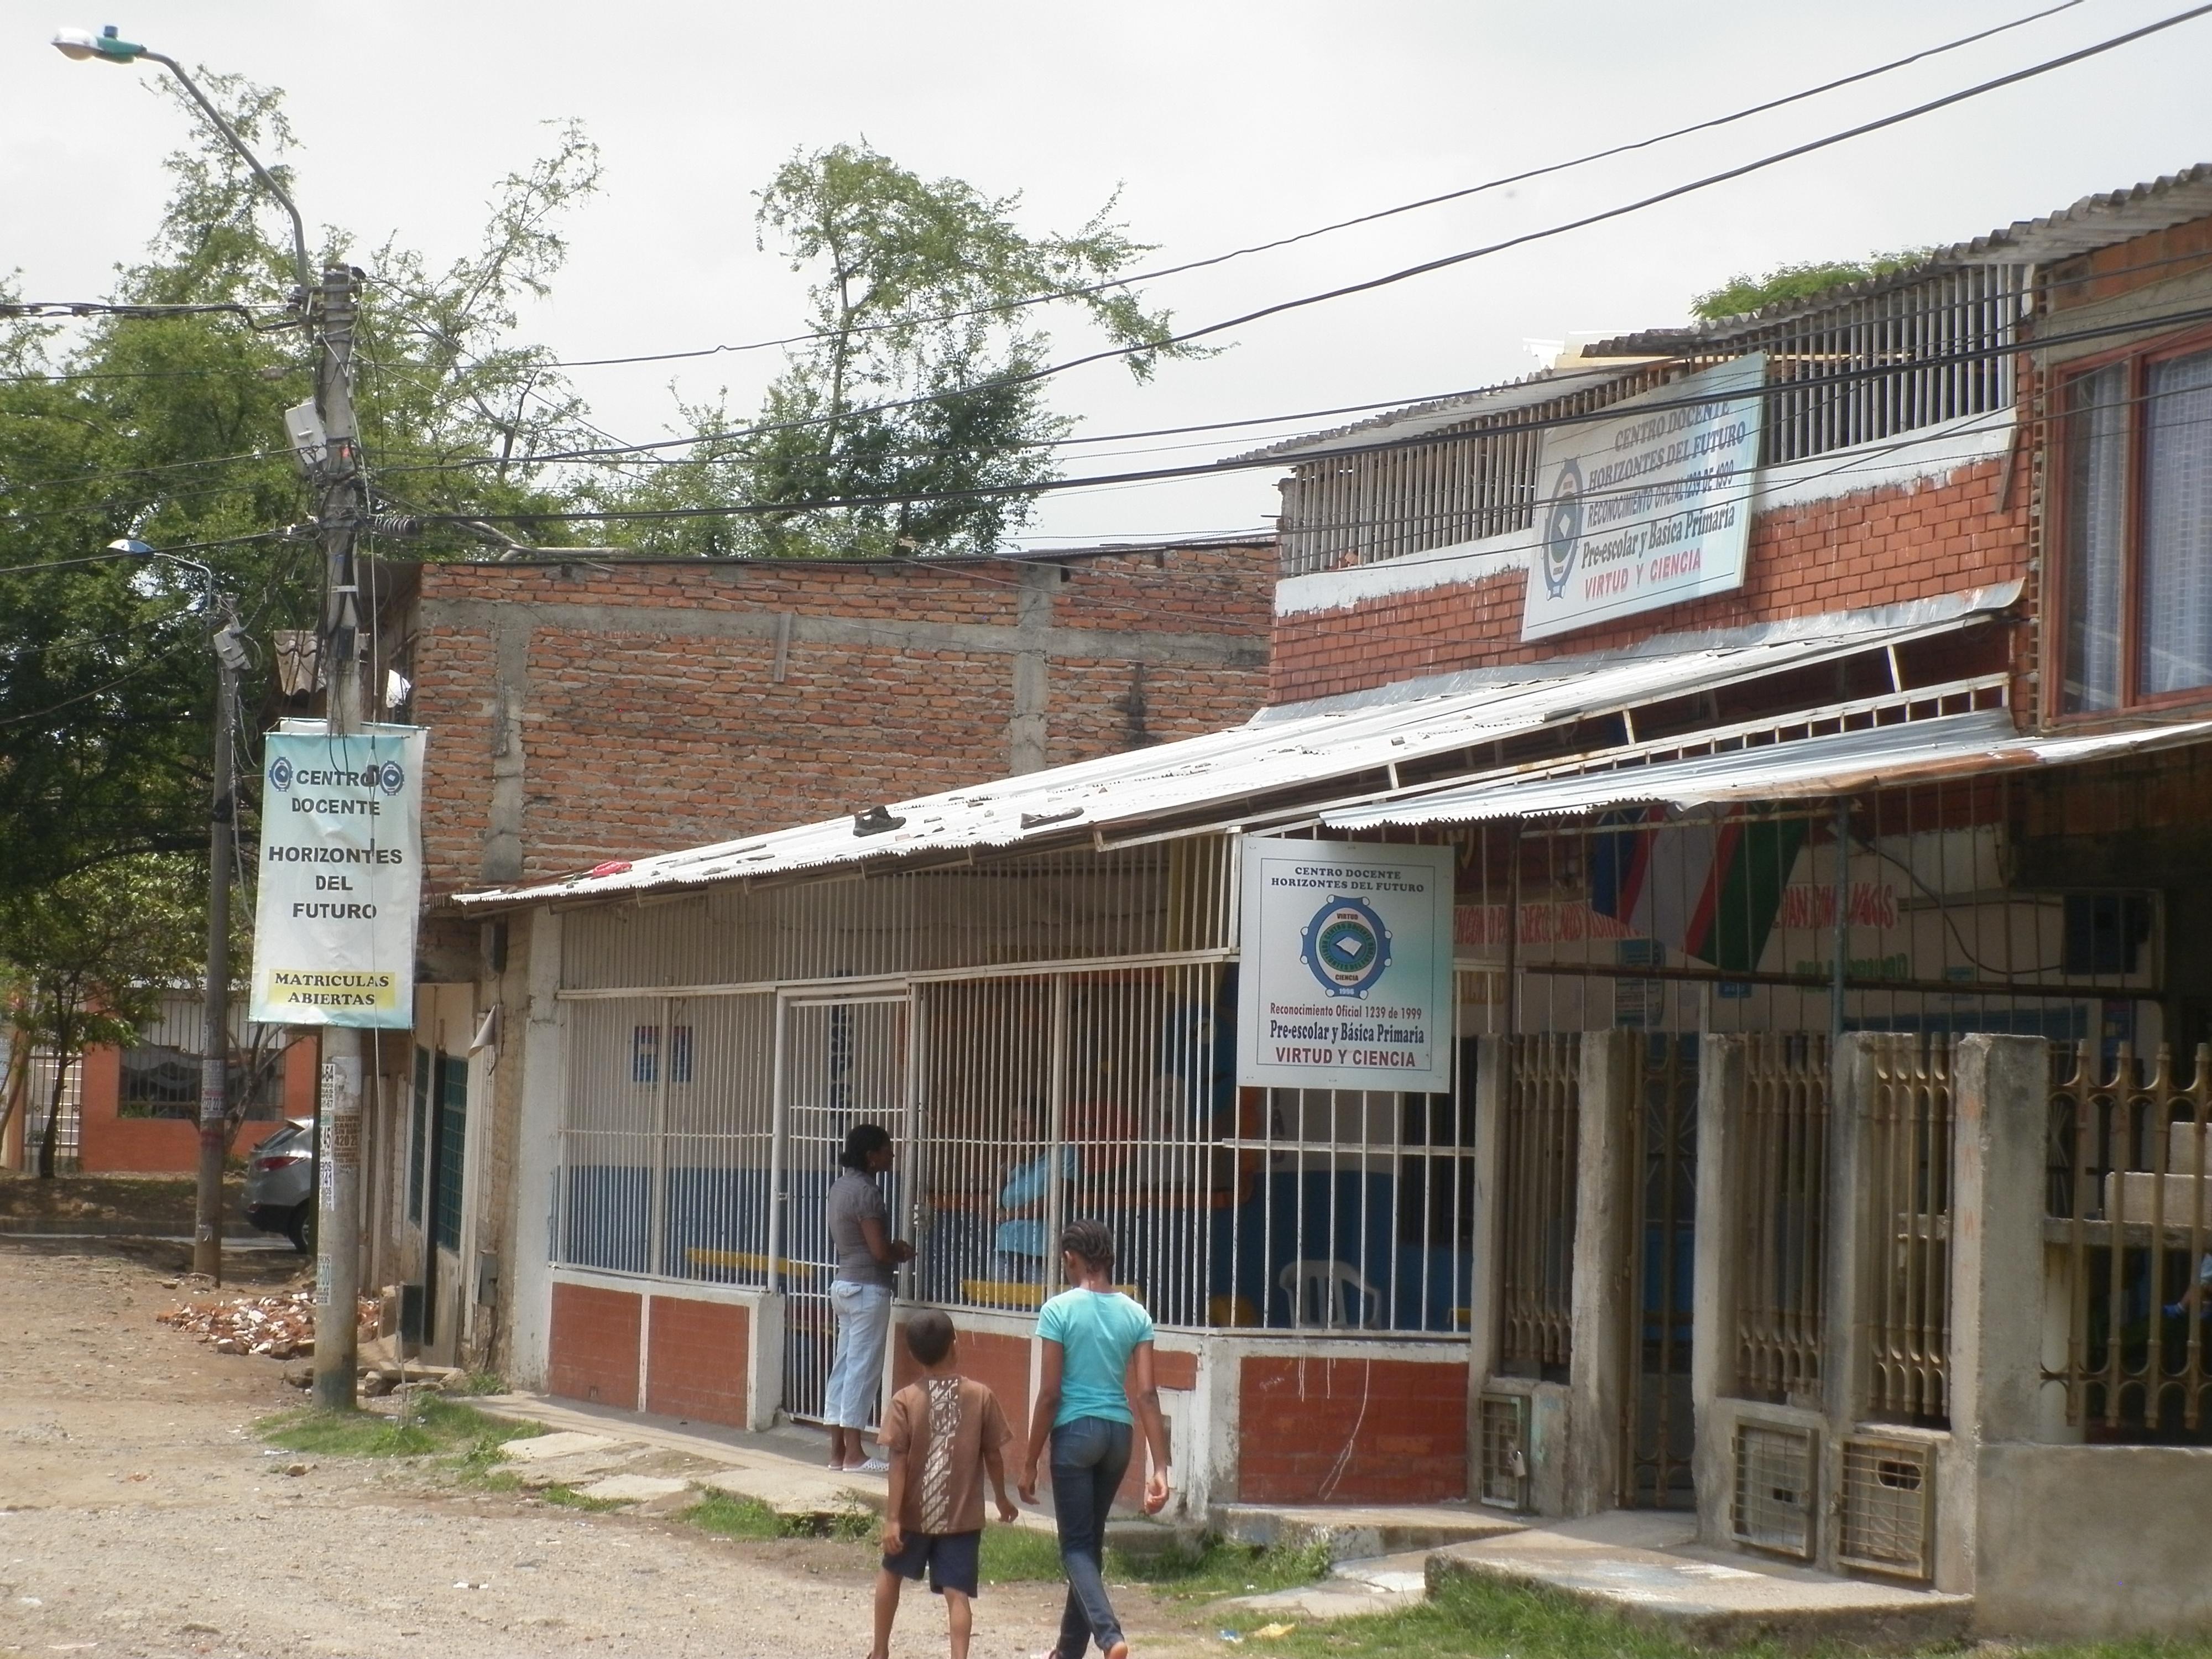 Centro docente horizontes del futuro cali barrio omar for Barrio el jardin cali colombia